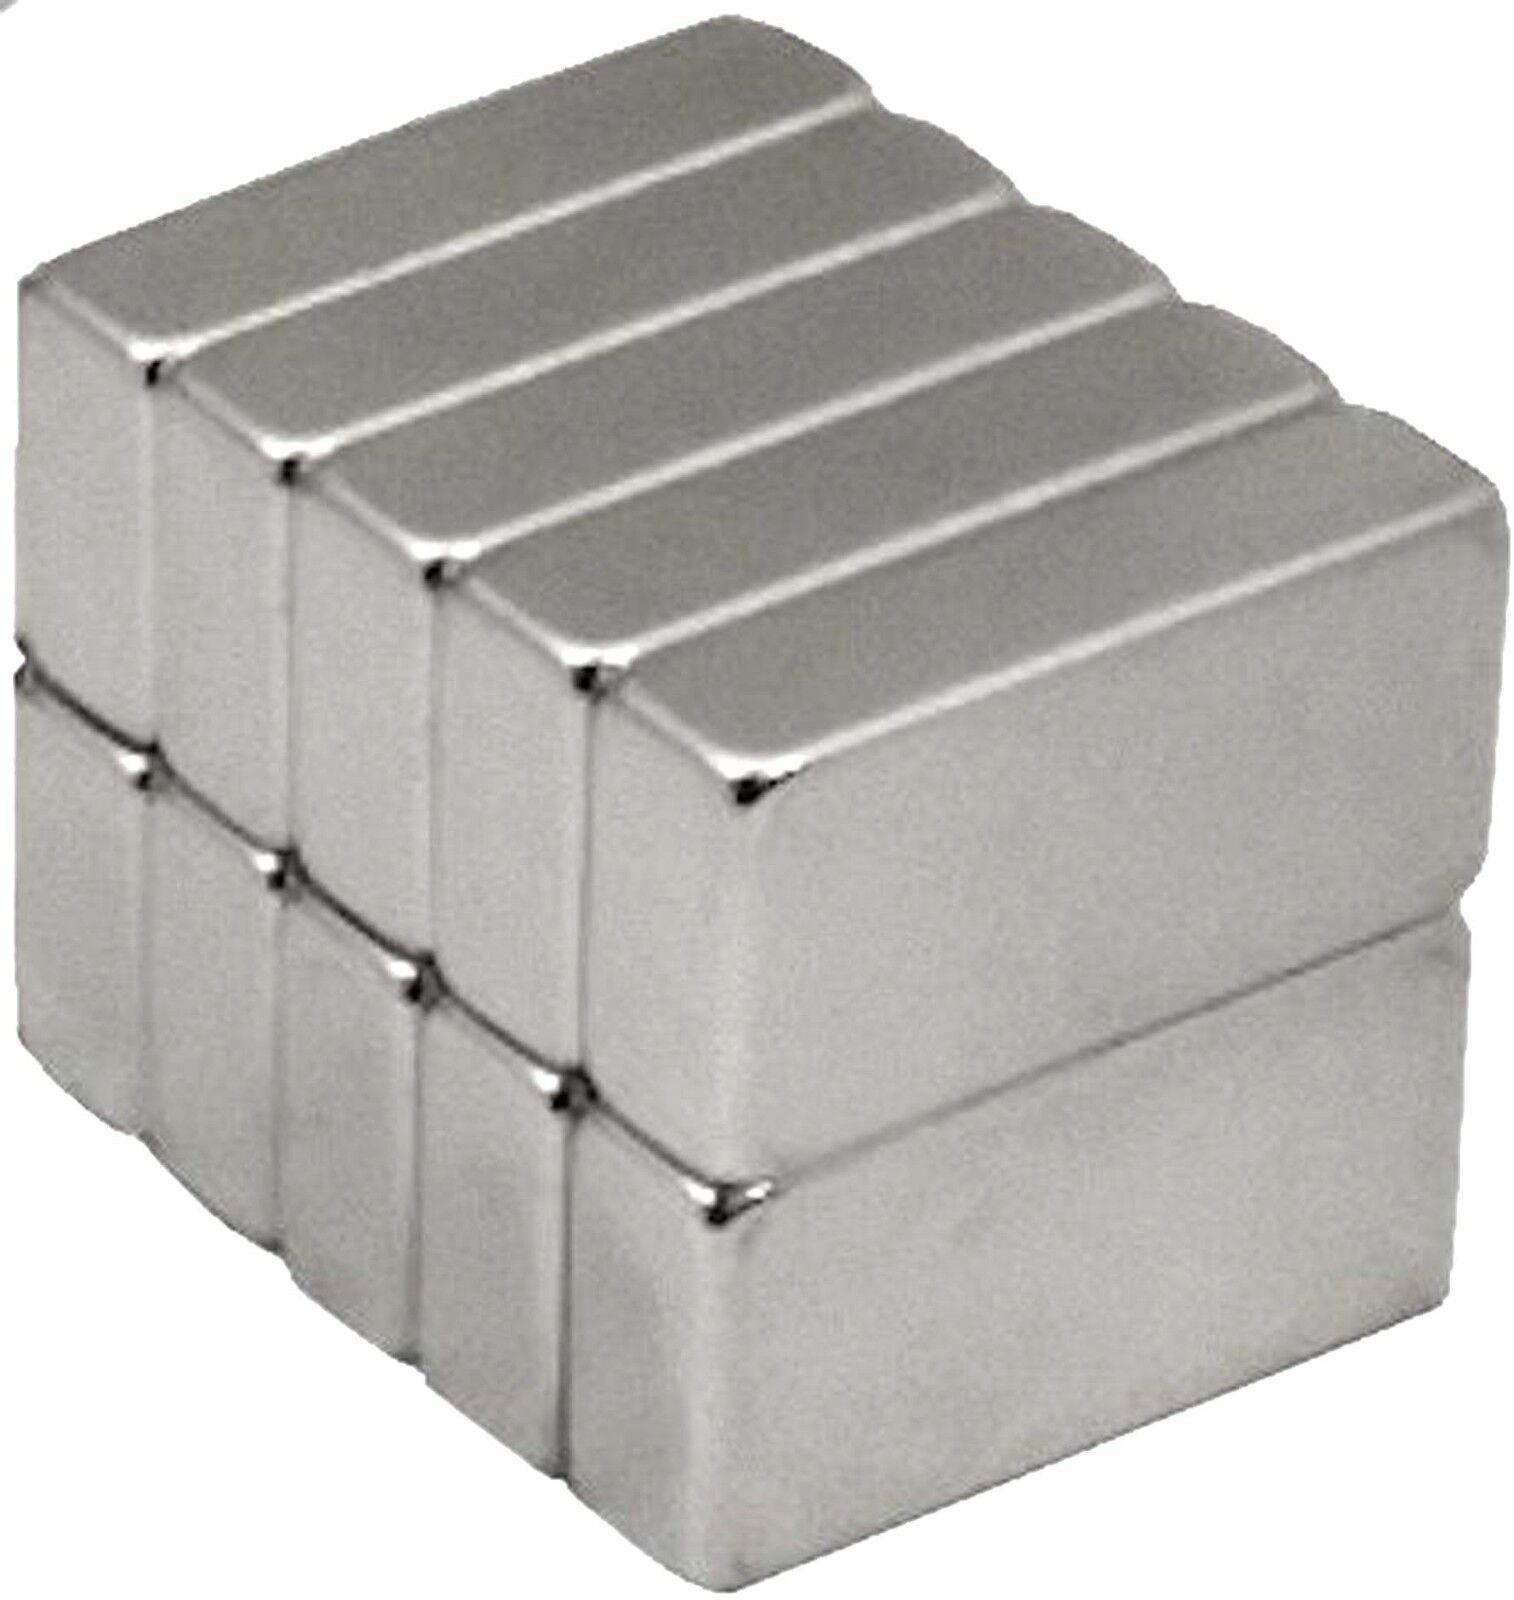 50 Pack 1//4 x 1//4 x 1//8 Inch Neodymium Rare Earth Block Magnets N48